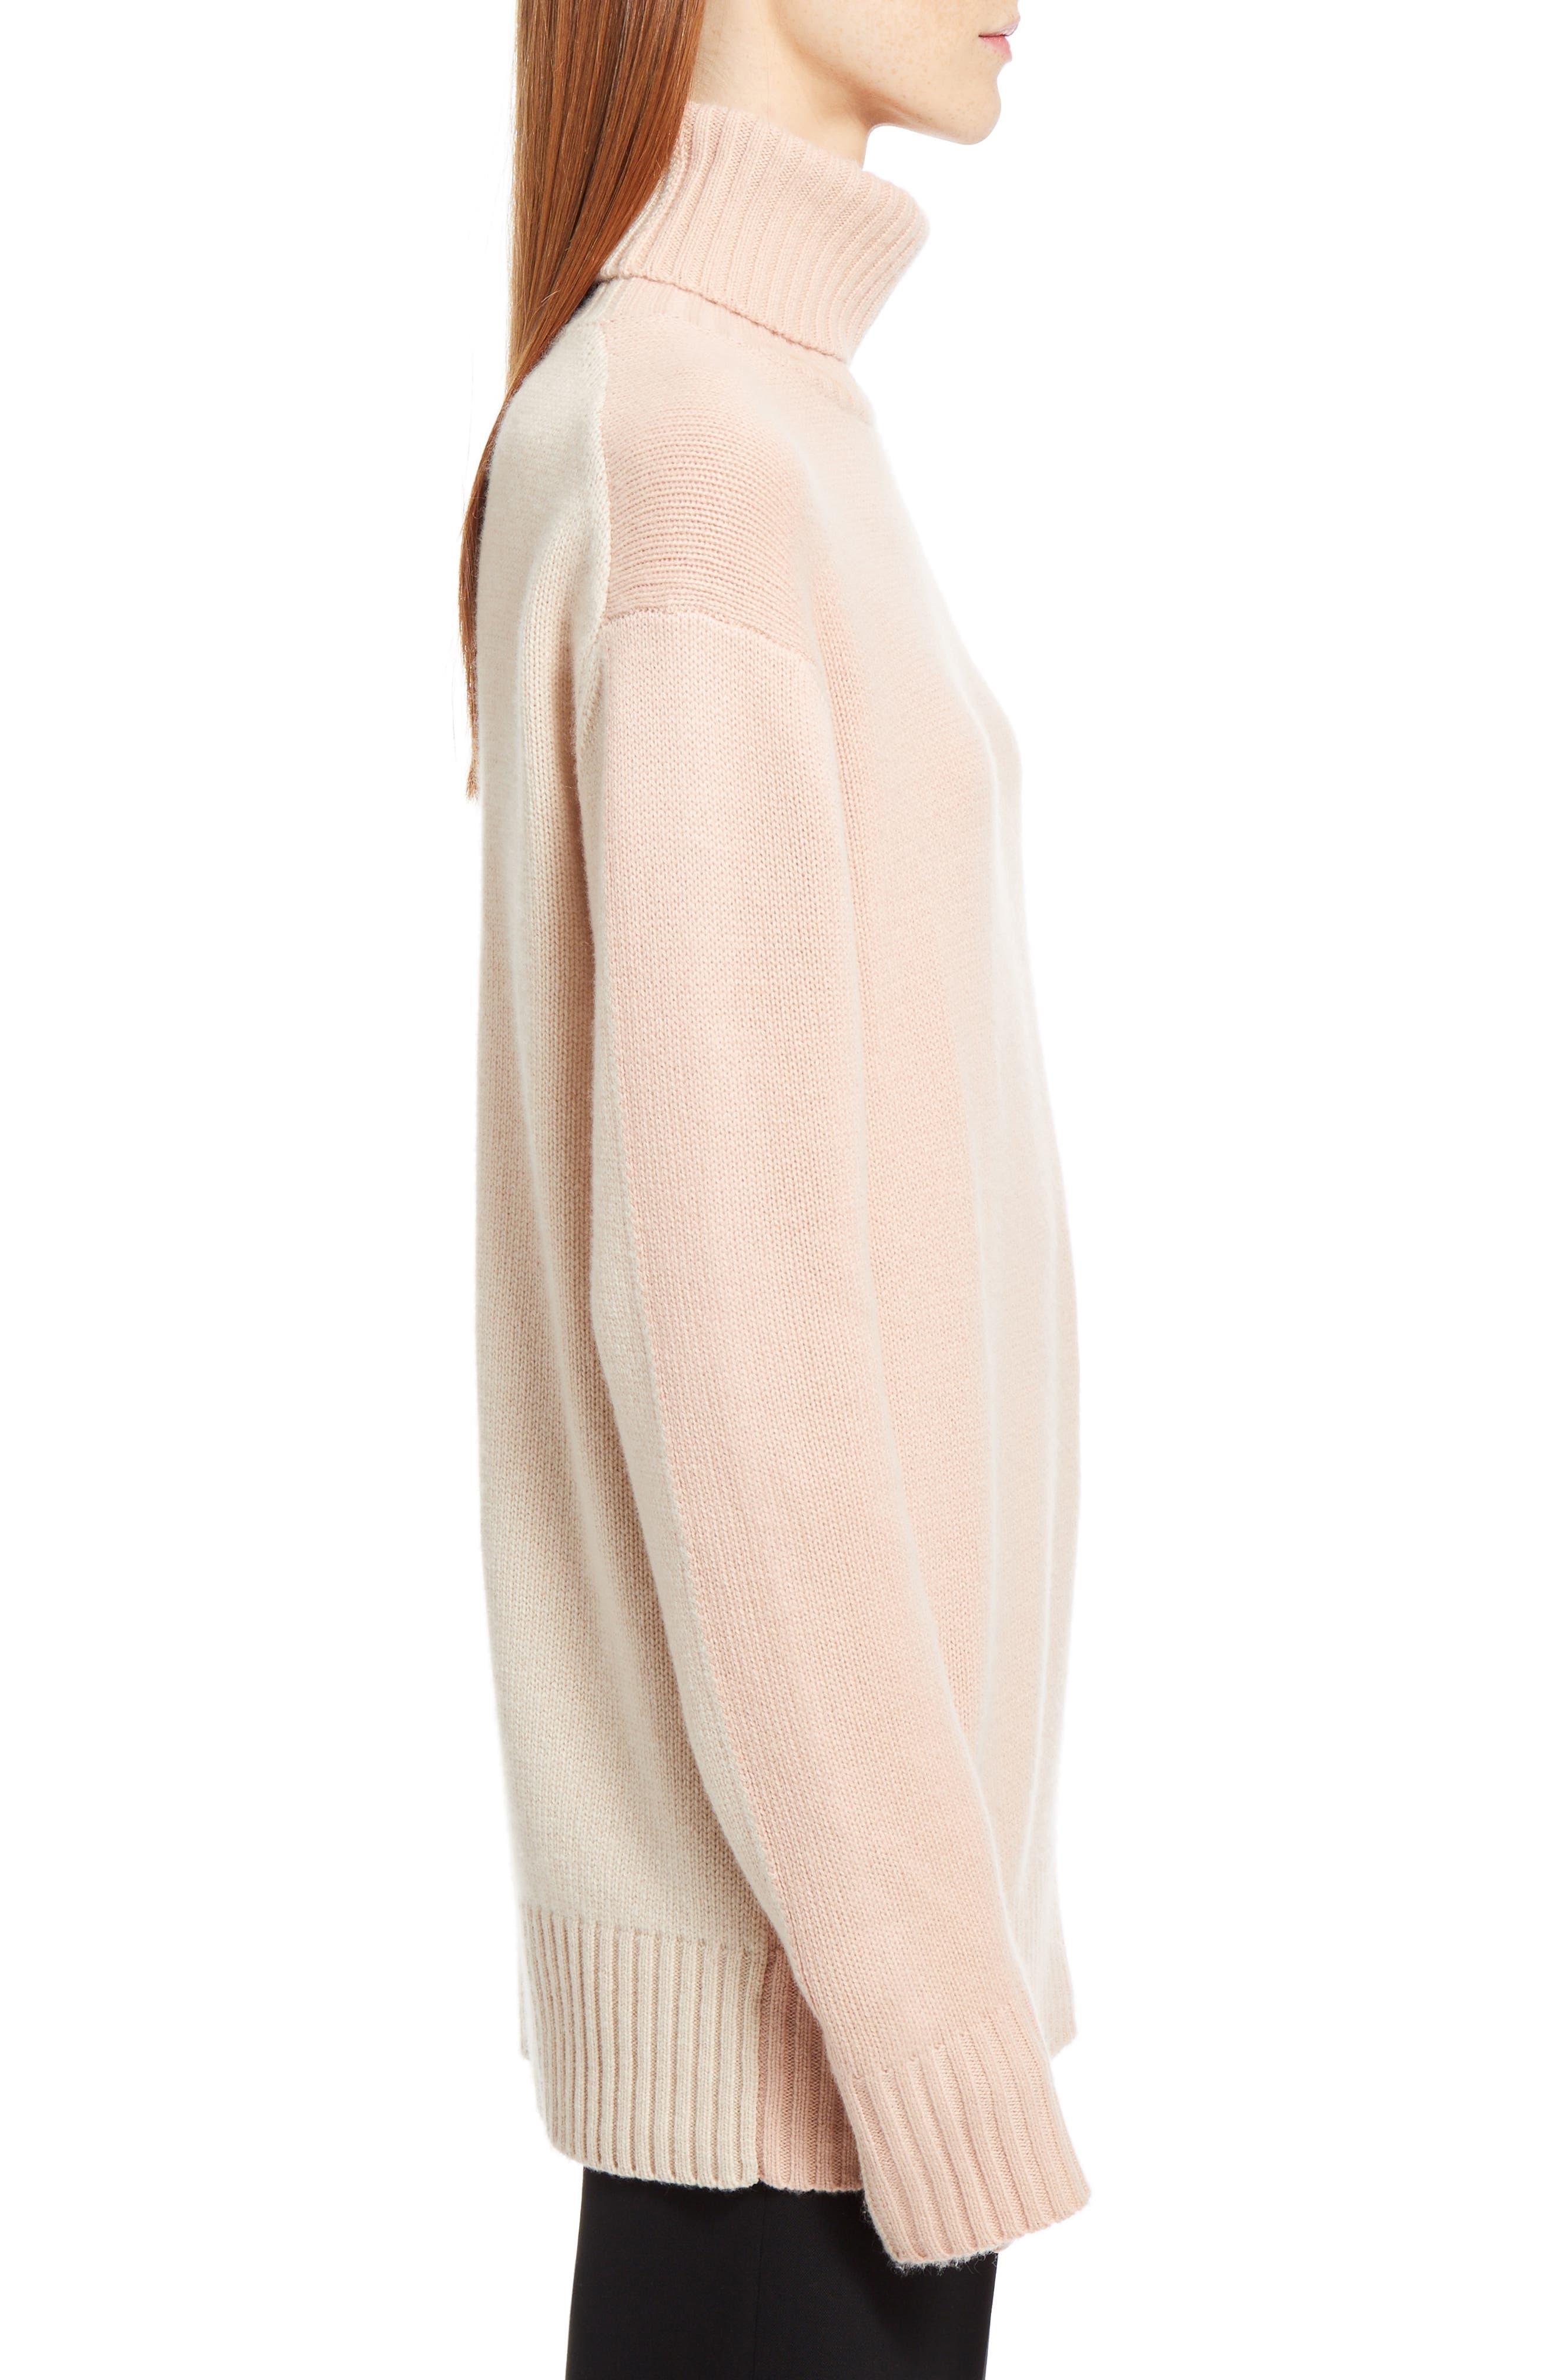 Colorblock Cashmere Turtleneck Sweater,                             Alternate thumbnail 3, color,                             650